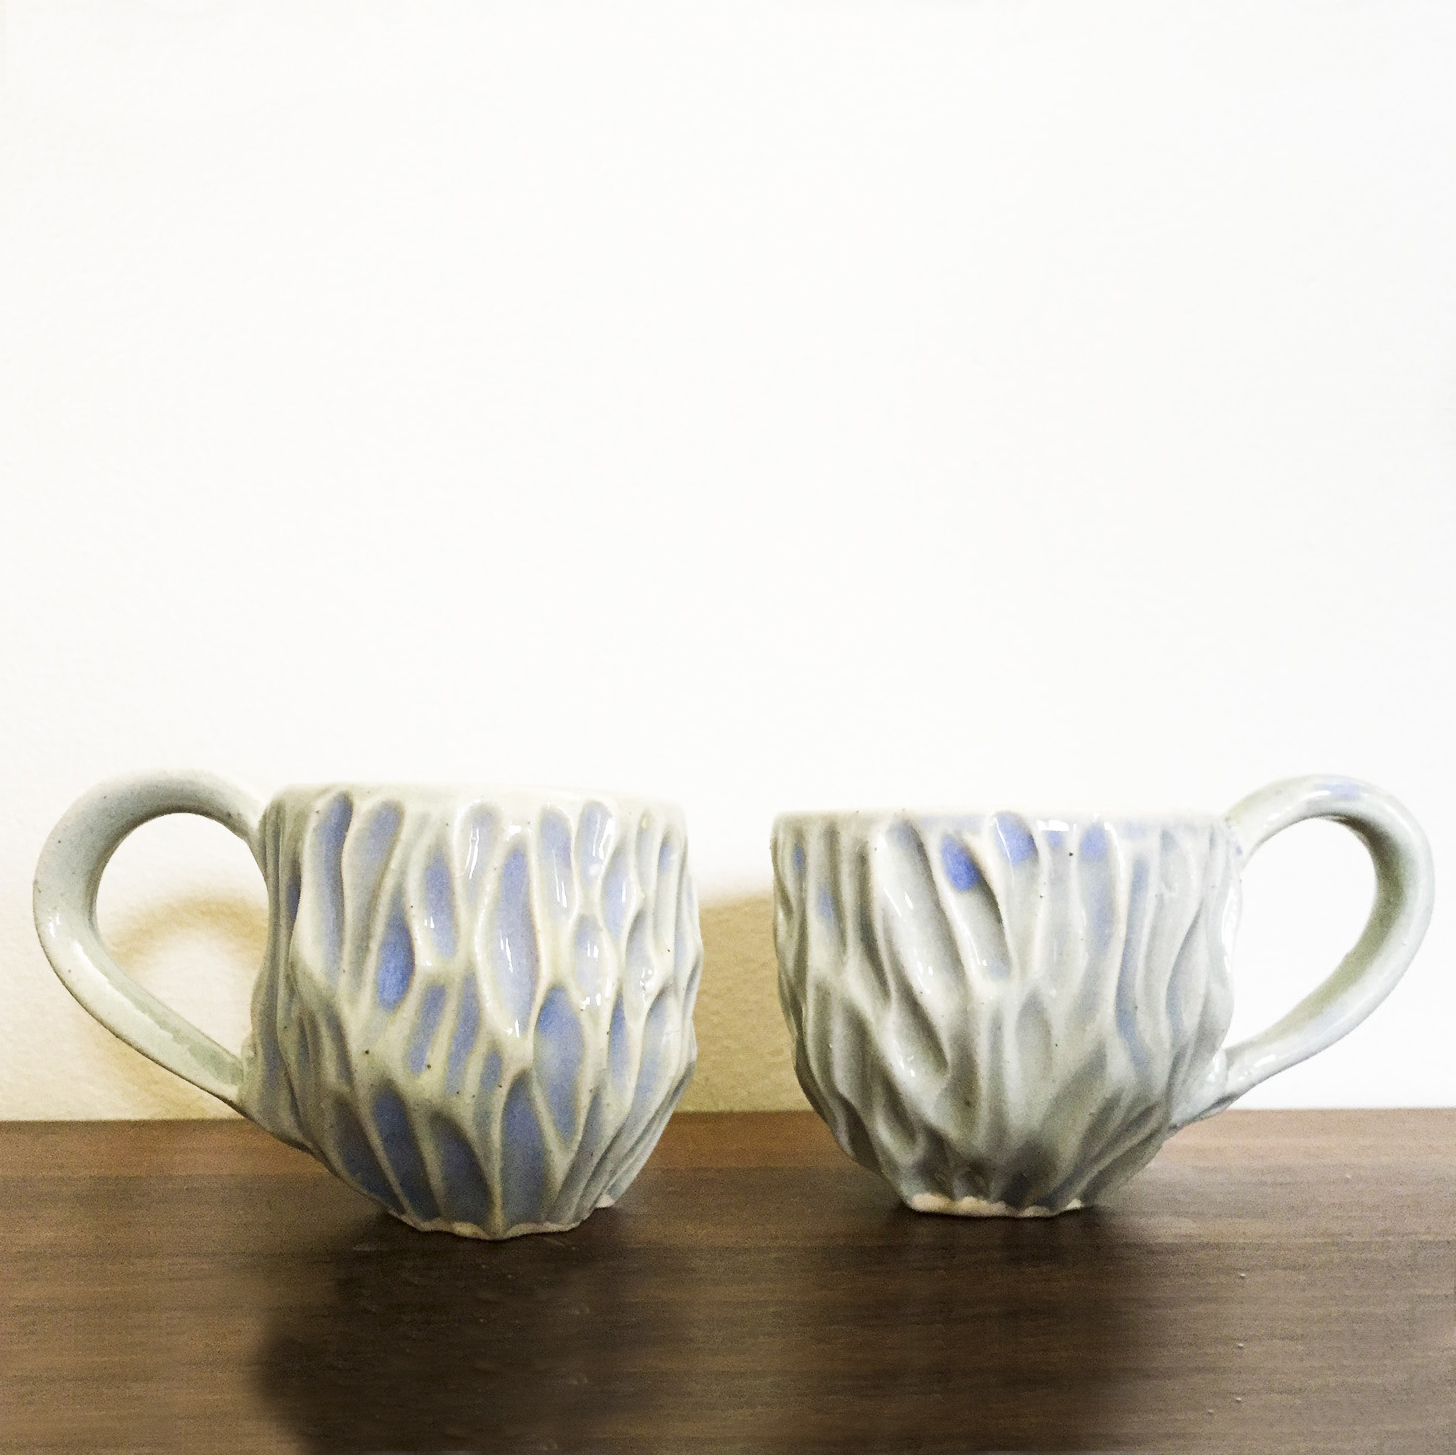 Small Hand Carved Ceramic Espresso Cups – Second – $10